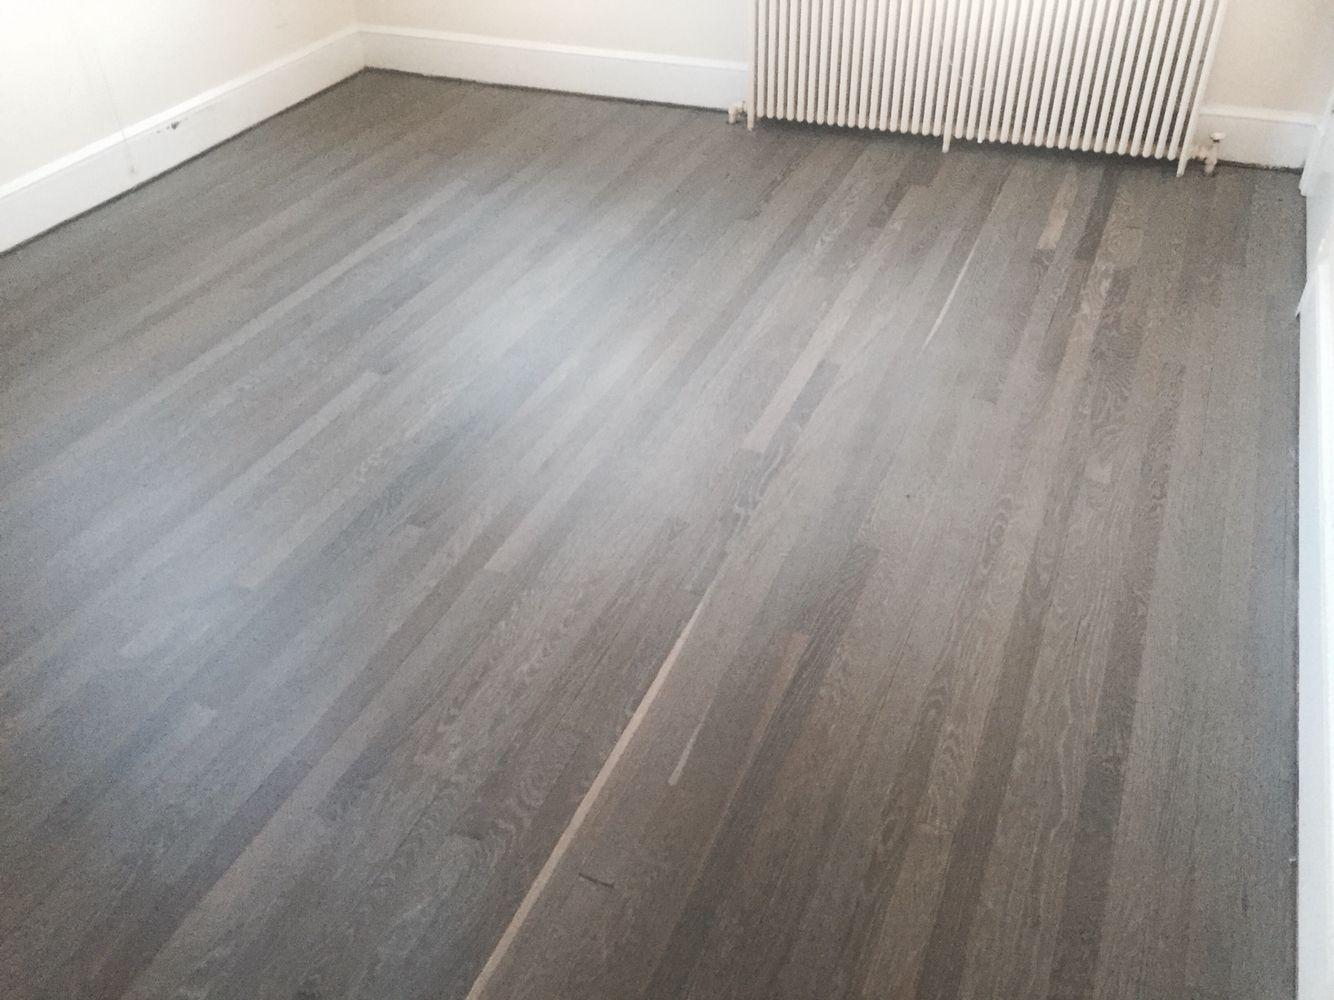 Refinished white oak floors with Rubio Fumed and Rubio 5 white floor oil  Hardwood Flooring